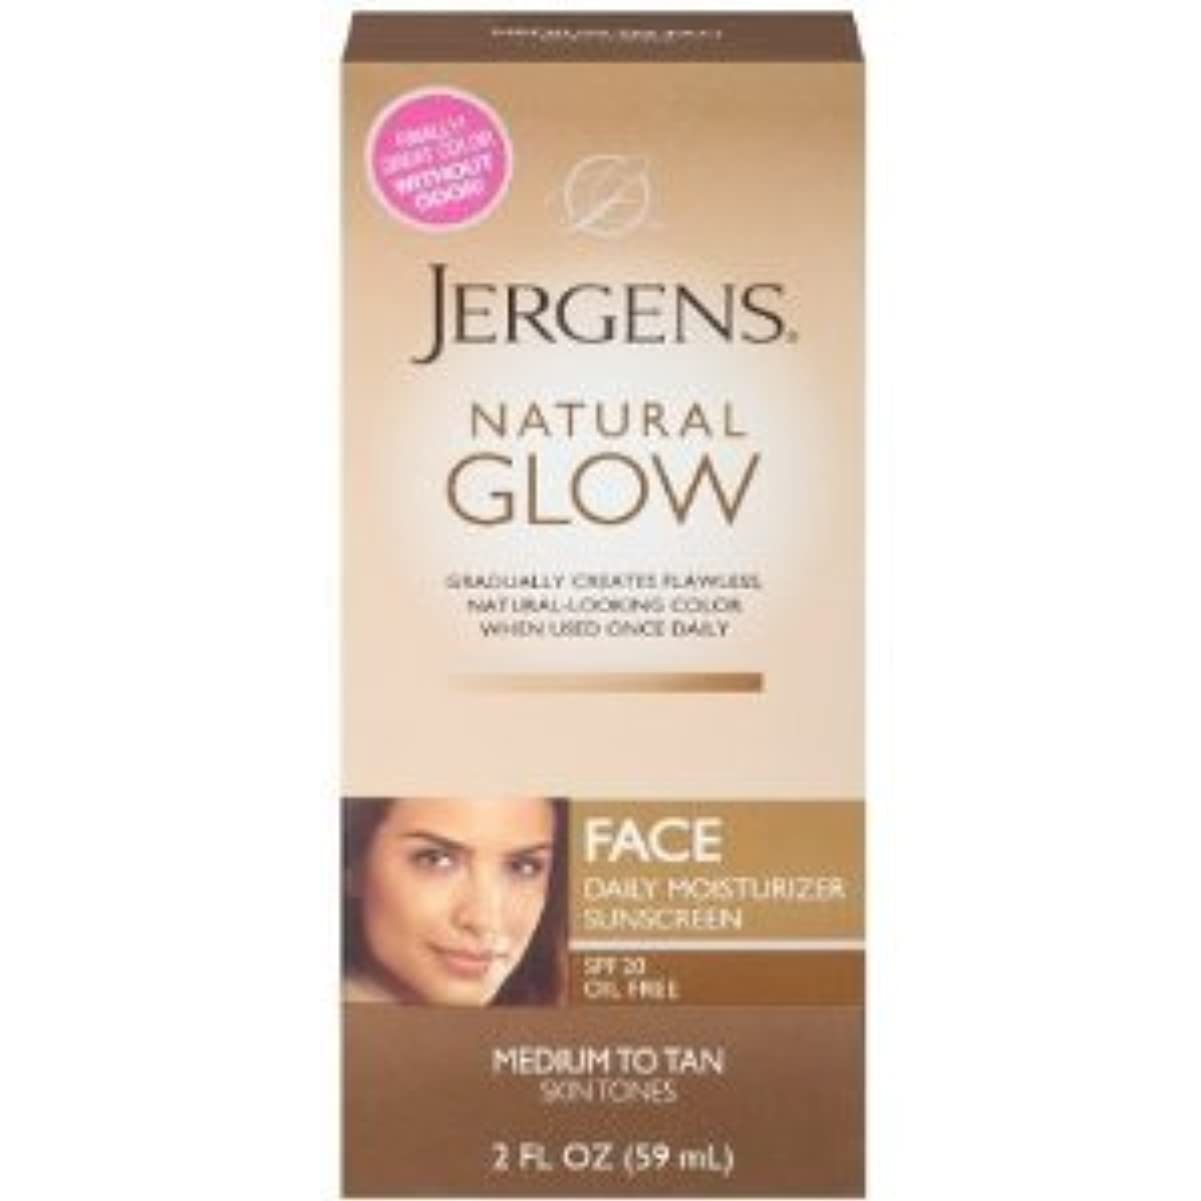 管理豚肉表現Natural Glow Healthy Complexion Daily Facial Moisturizer, SPF 20, Medium to Tan, (59ml) (海外直送品)